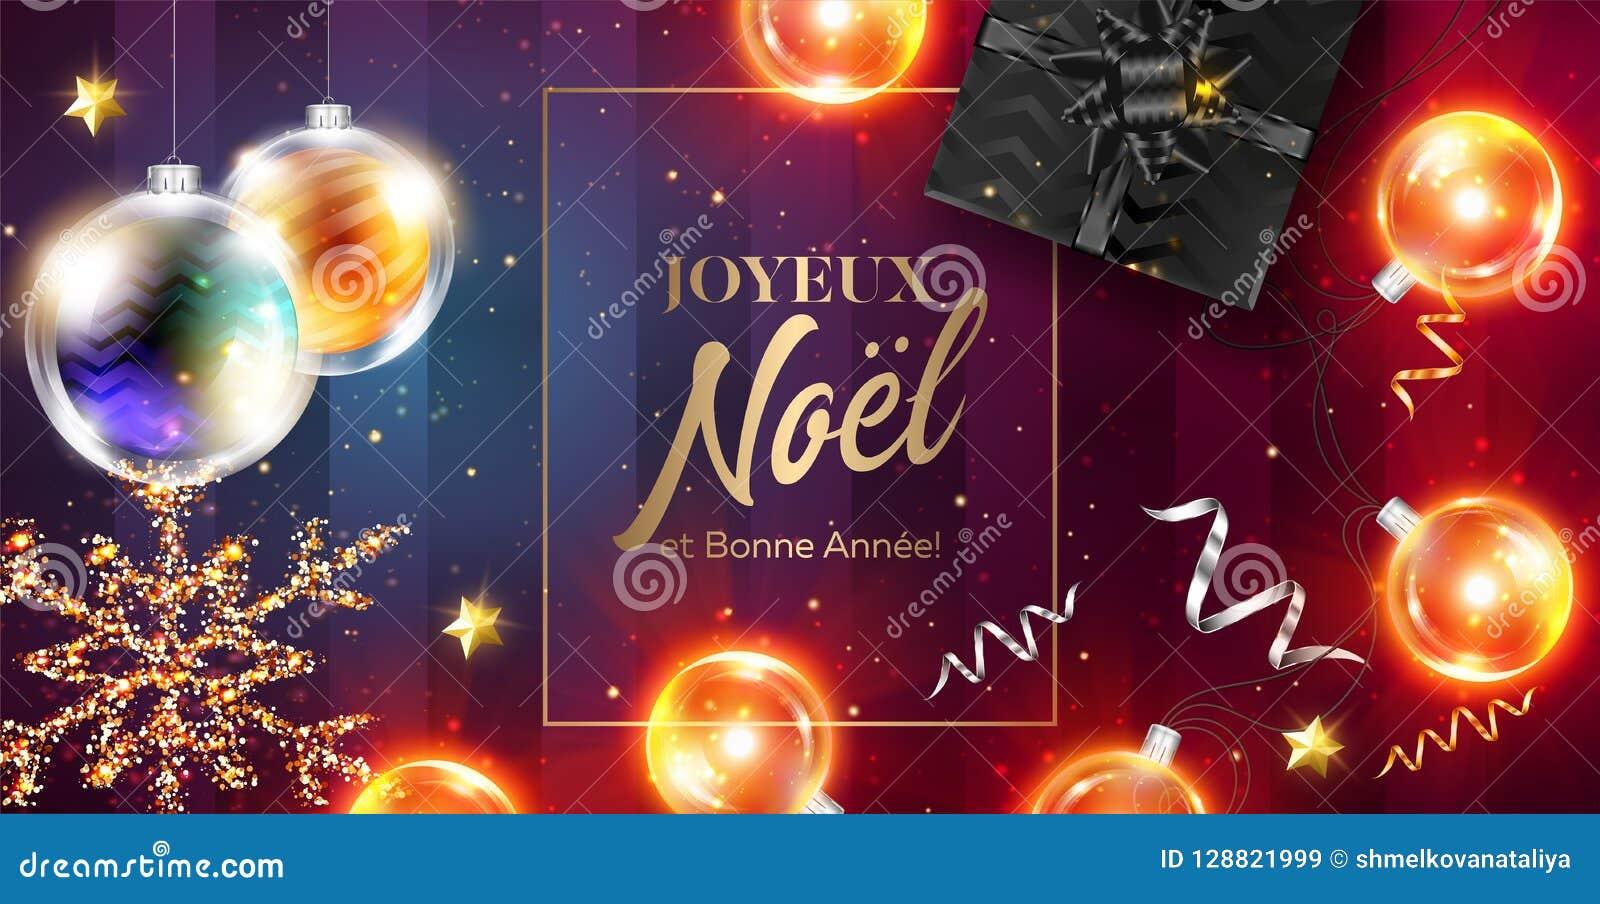 Photos De Joyeux Noel 2019.Joyeux Noel Et Bonne Annee Vector Card Merry Christmas